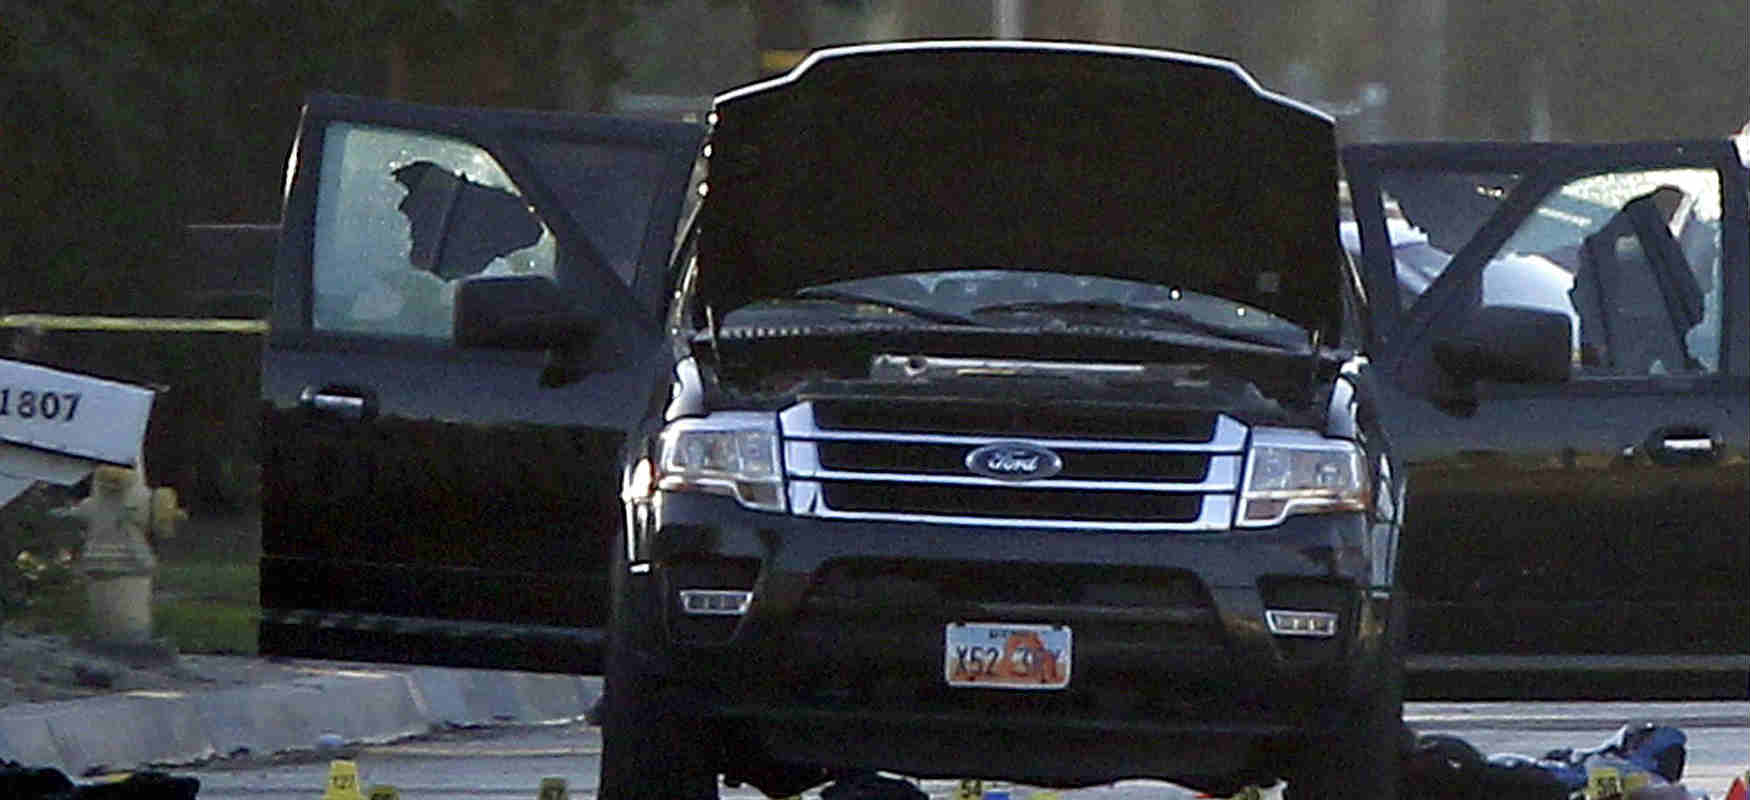 The San Bernardino Mass Shooting Getaway Car 2nd Location